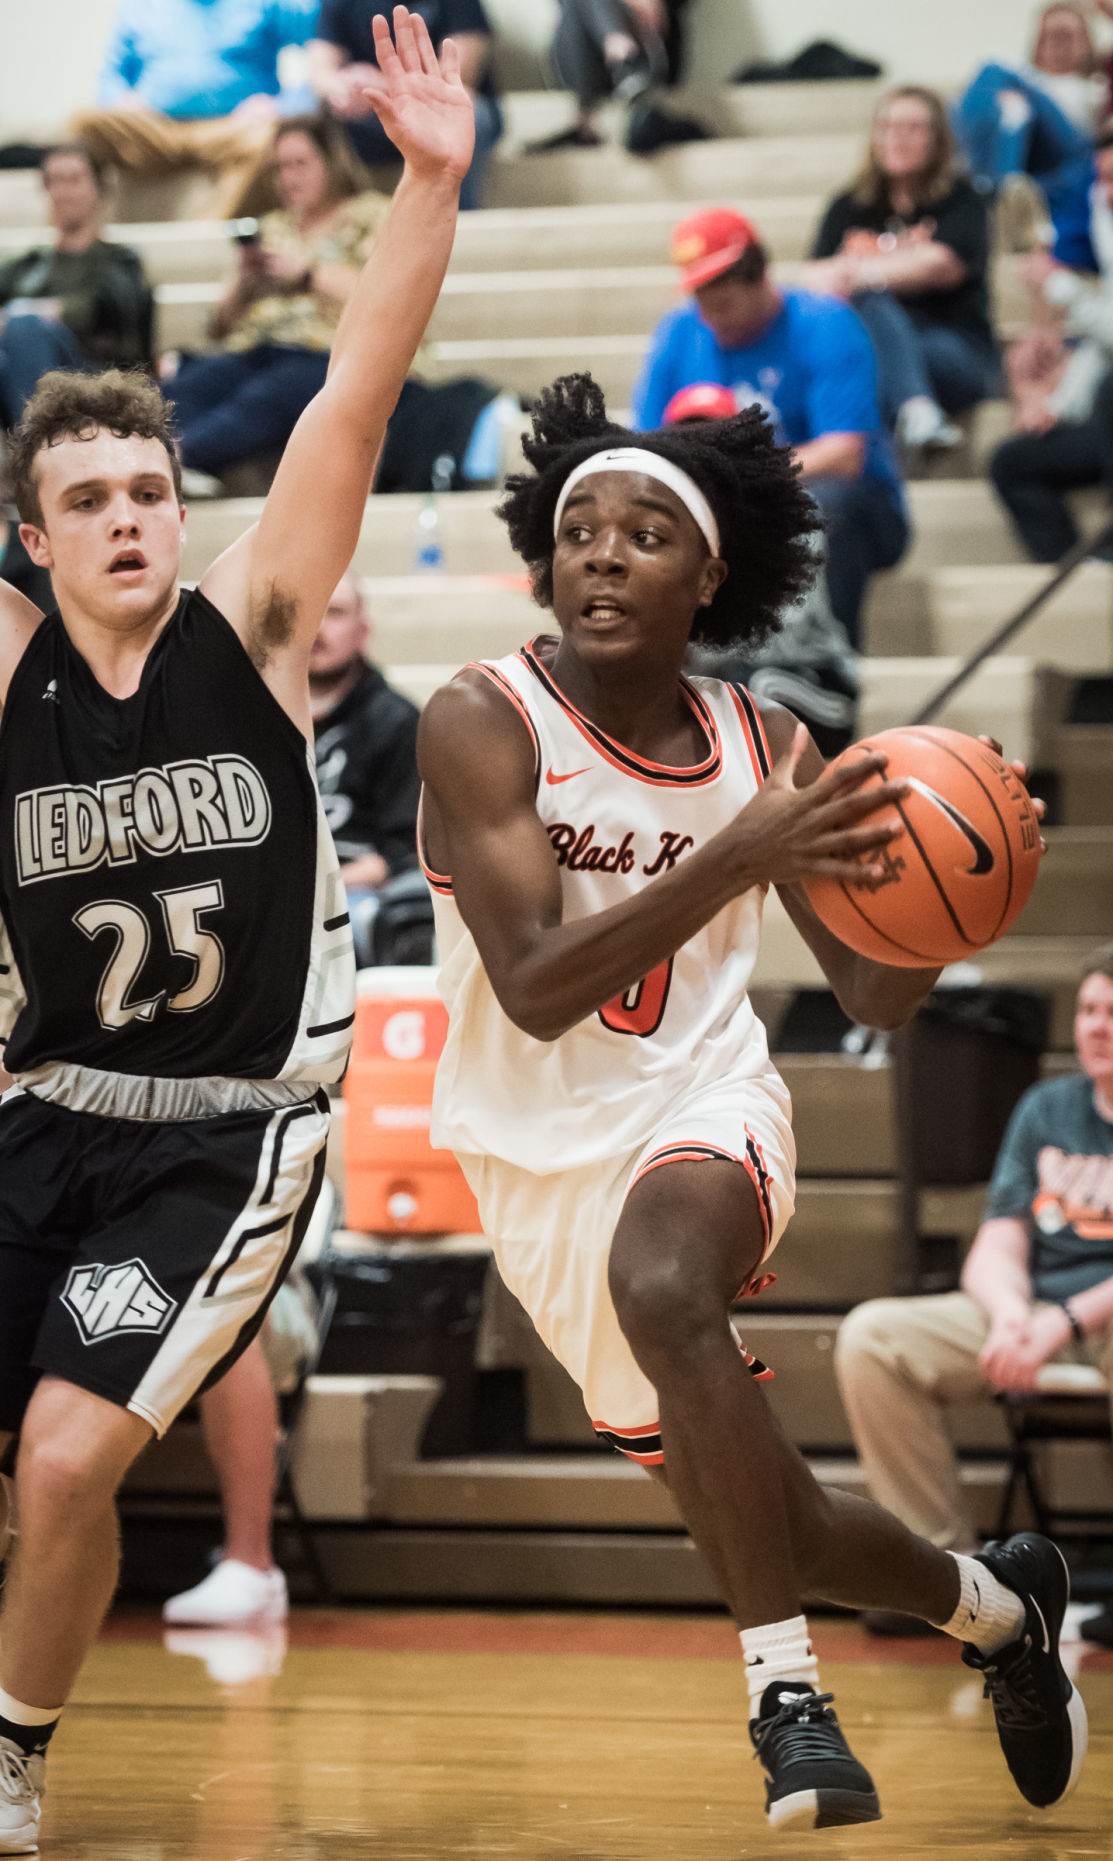 North Davidson Ledford Boys Basketball